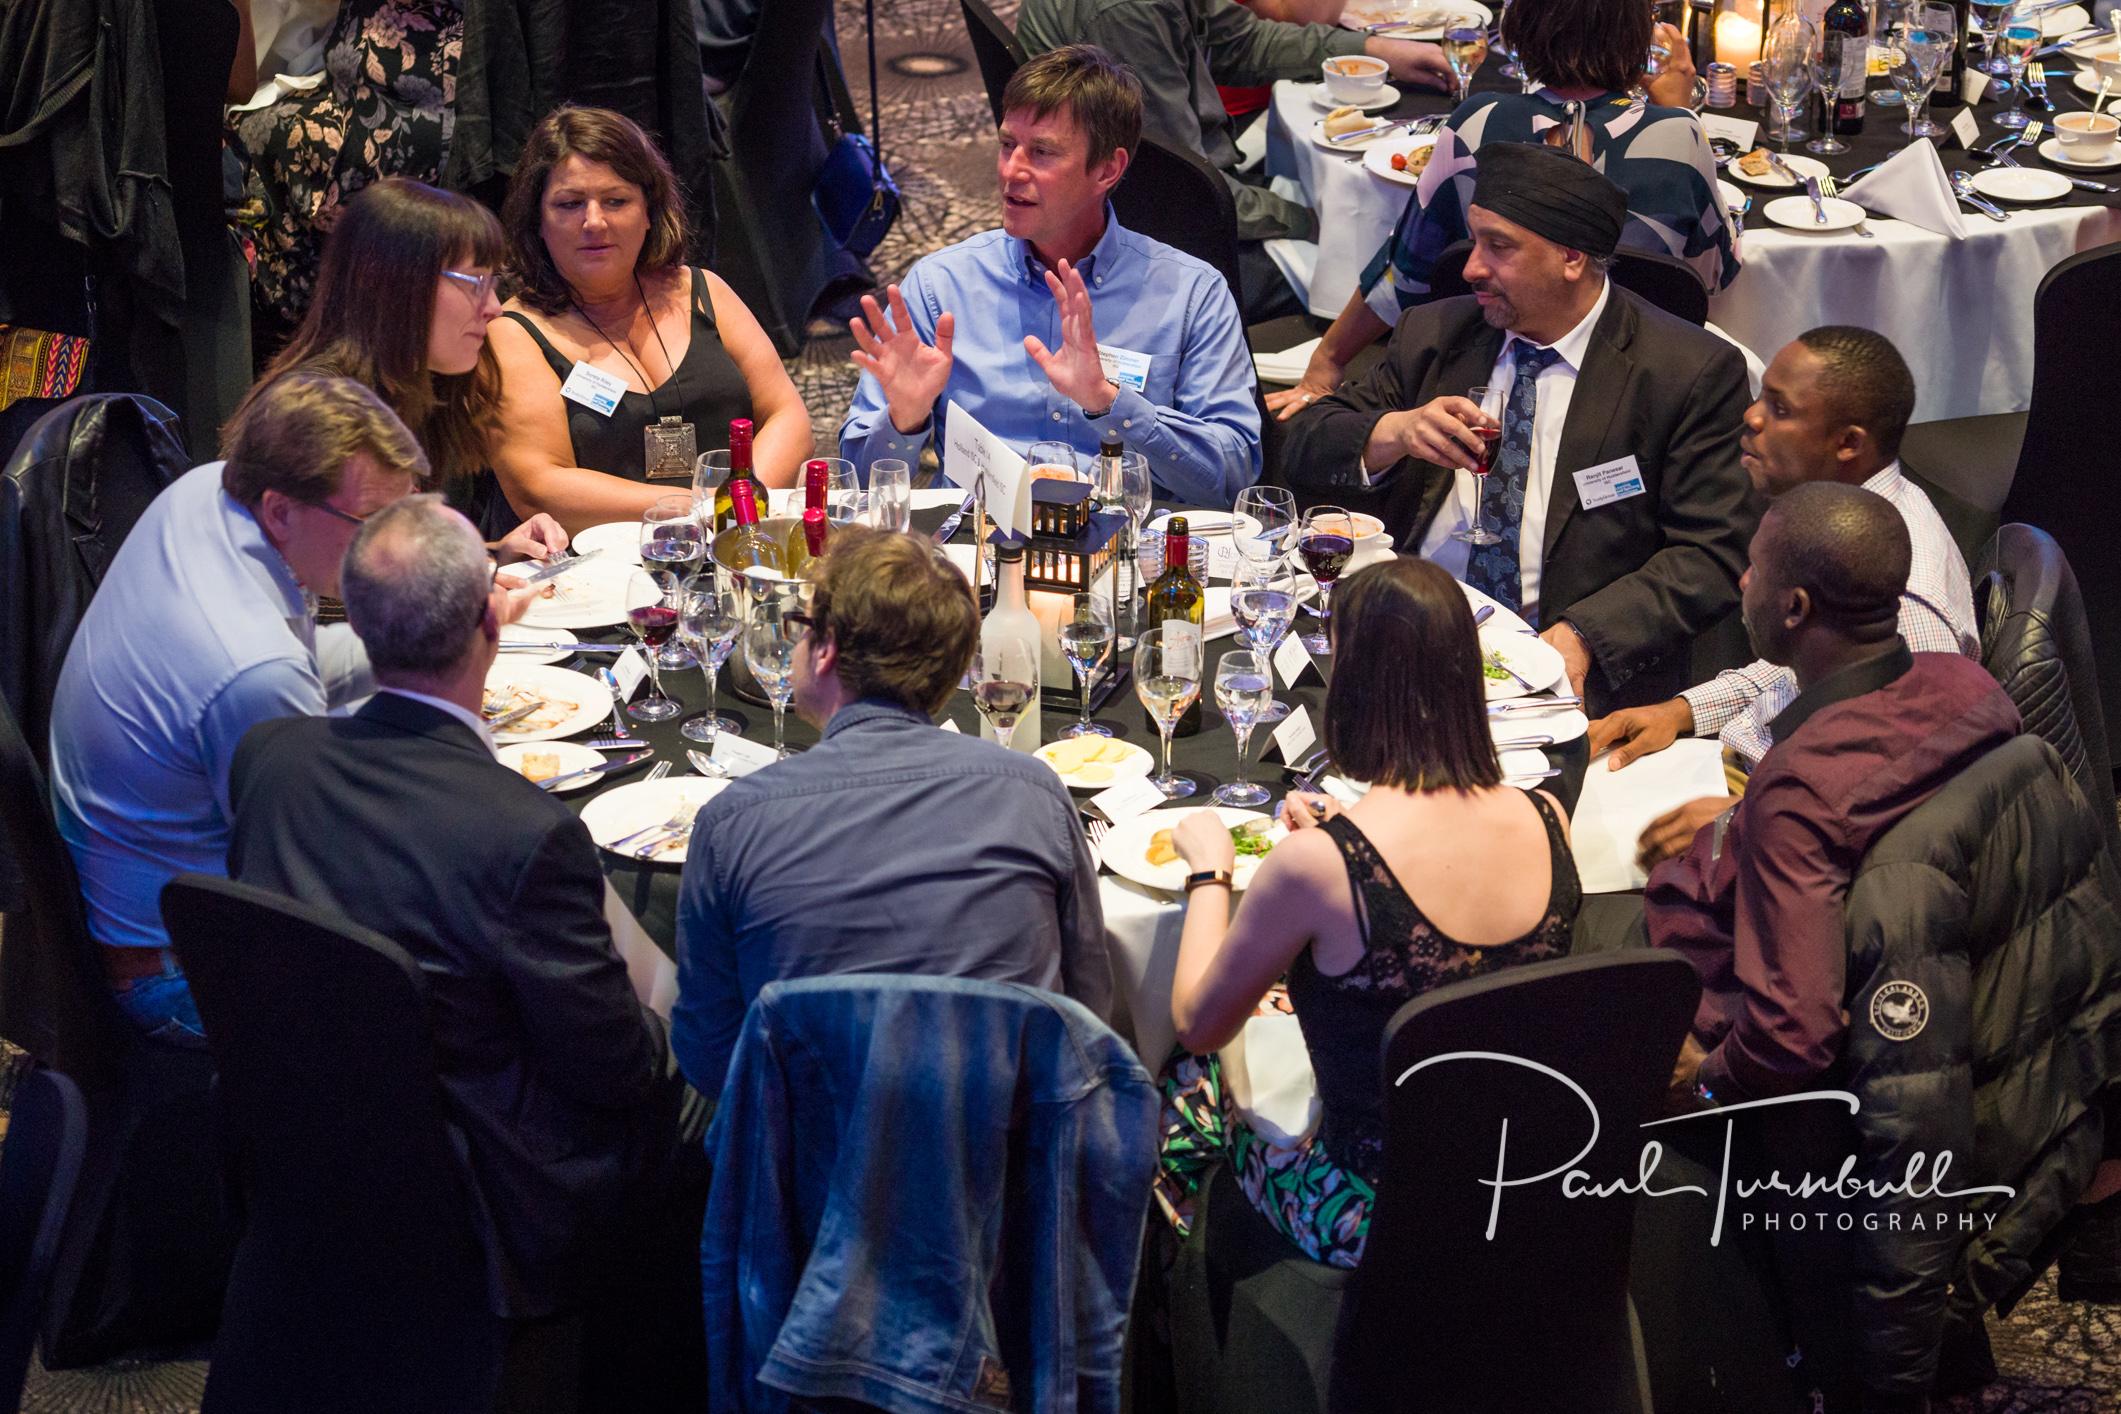 conference-event-photographer-queens-hotel-leeds-yorkshire-015.jpg